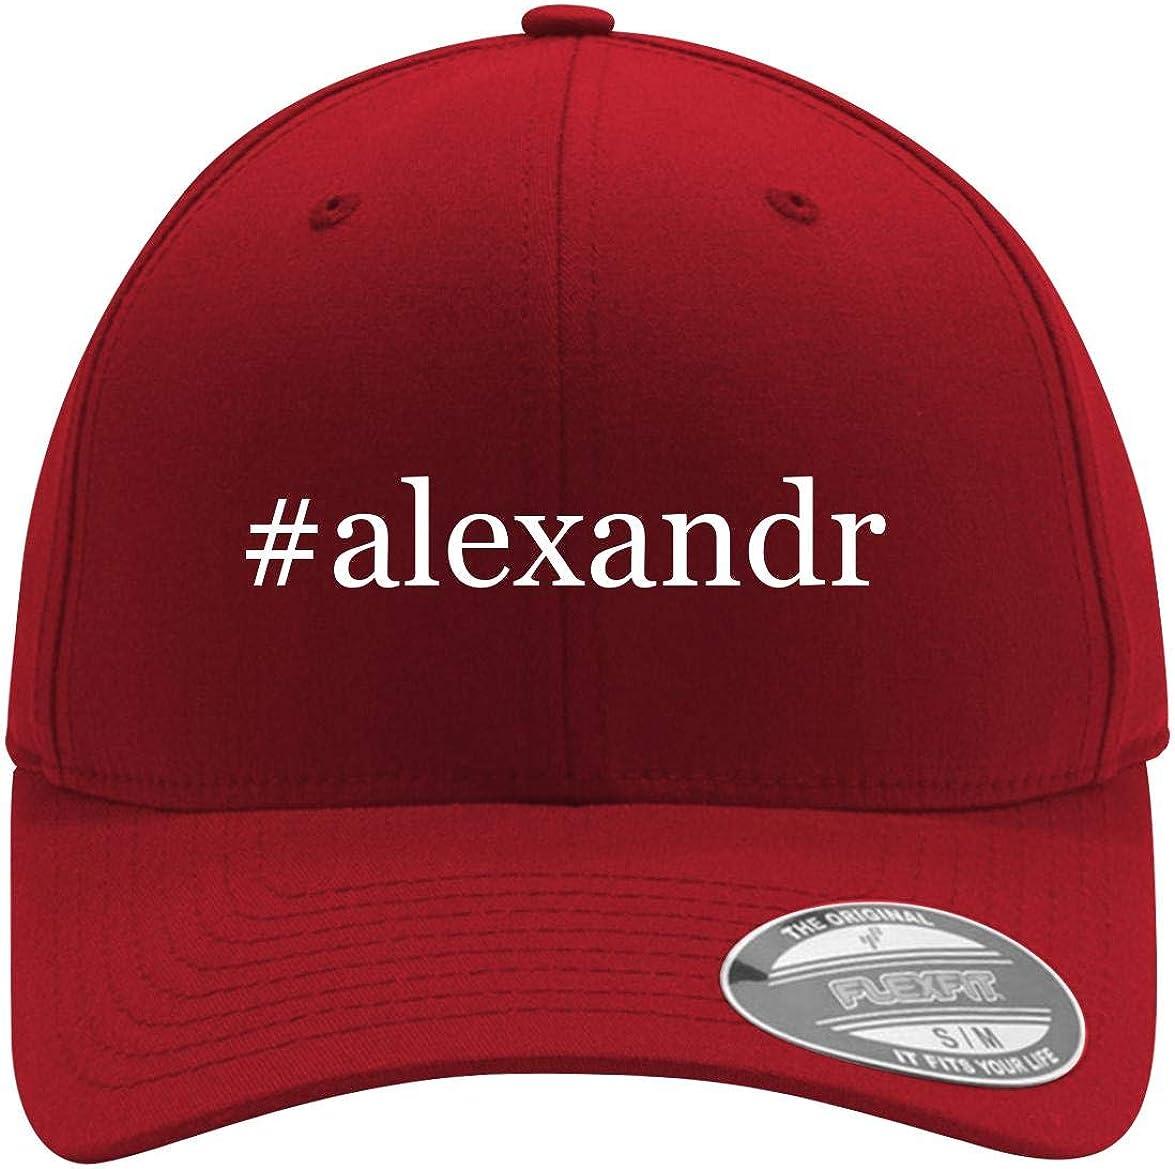 #alexandr - Adult Men's Hashtag Flexfit Baseball Hat Cap 61ZyZ1FqNcL